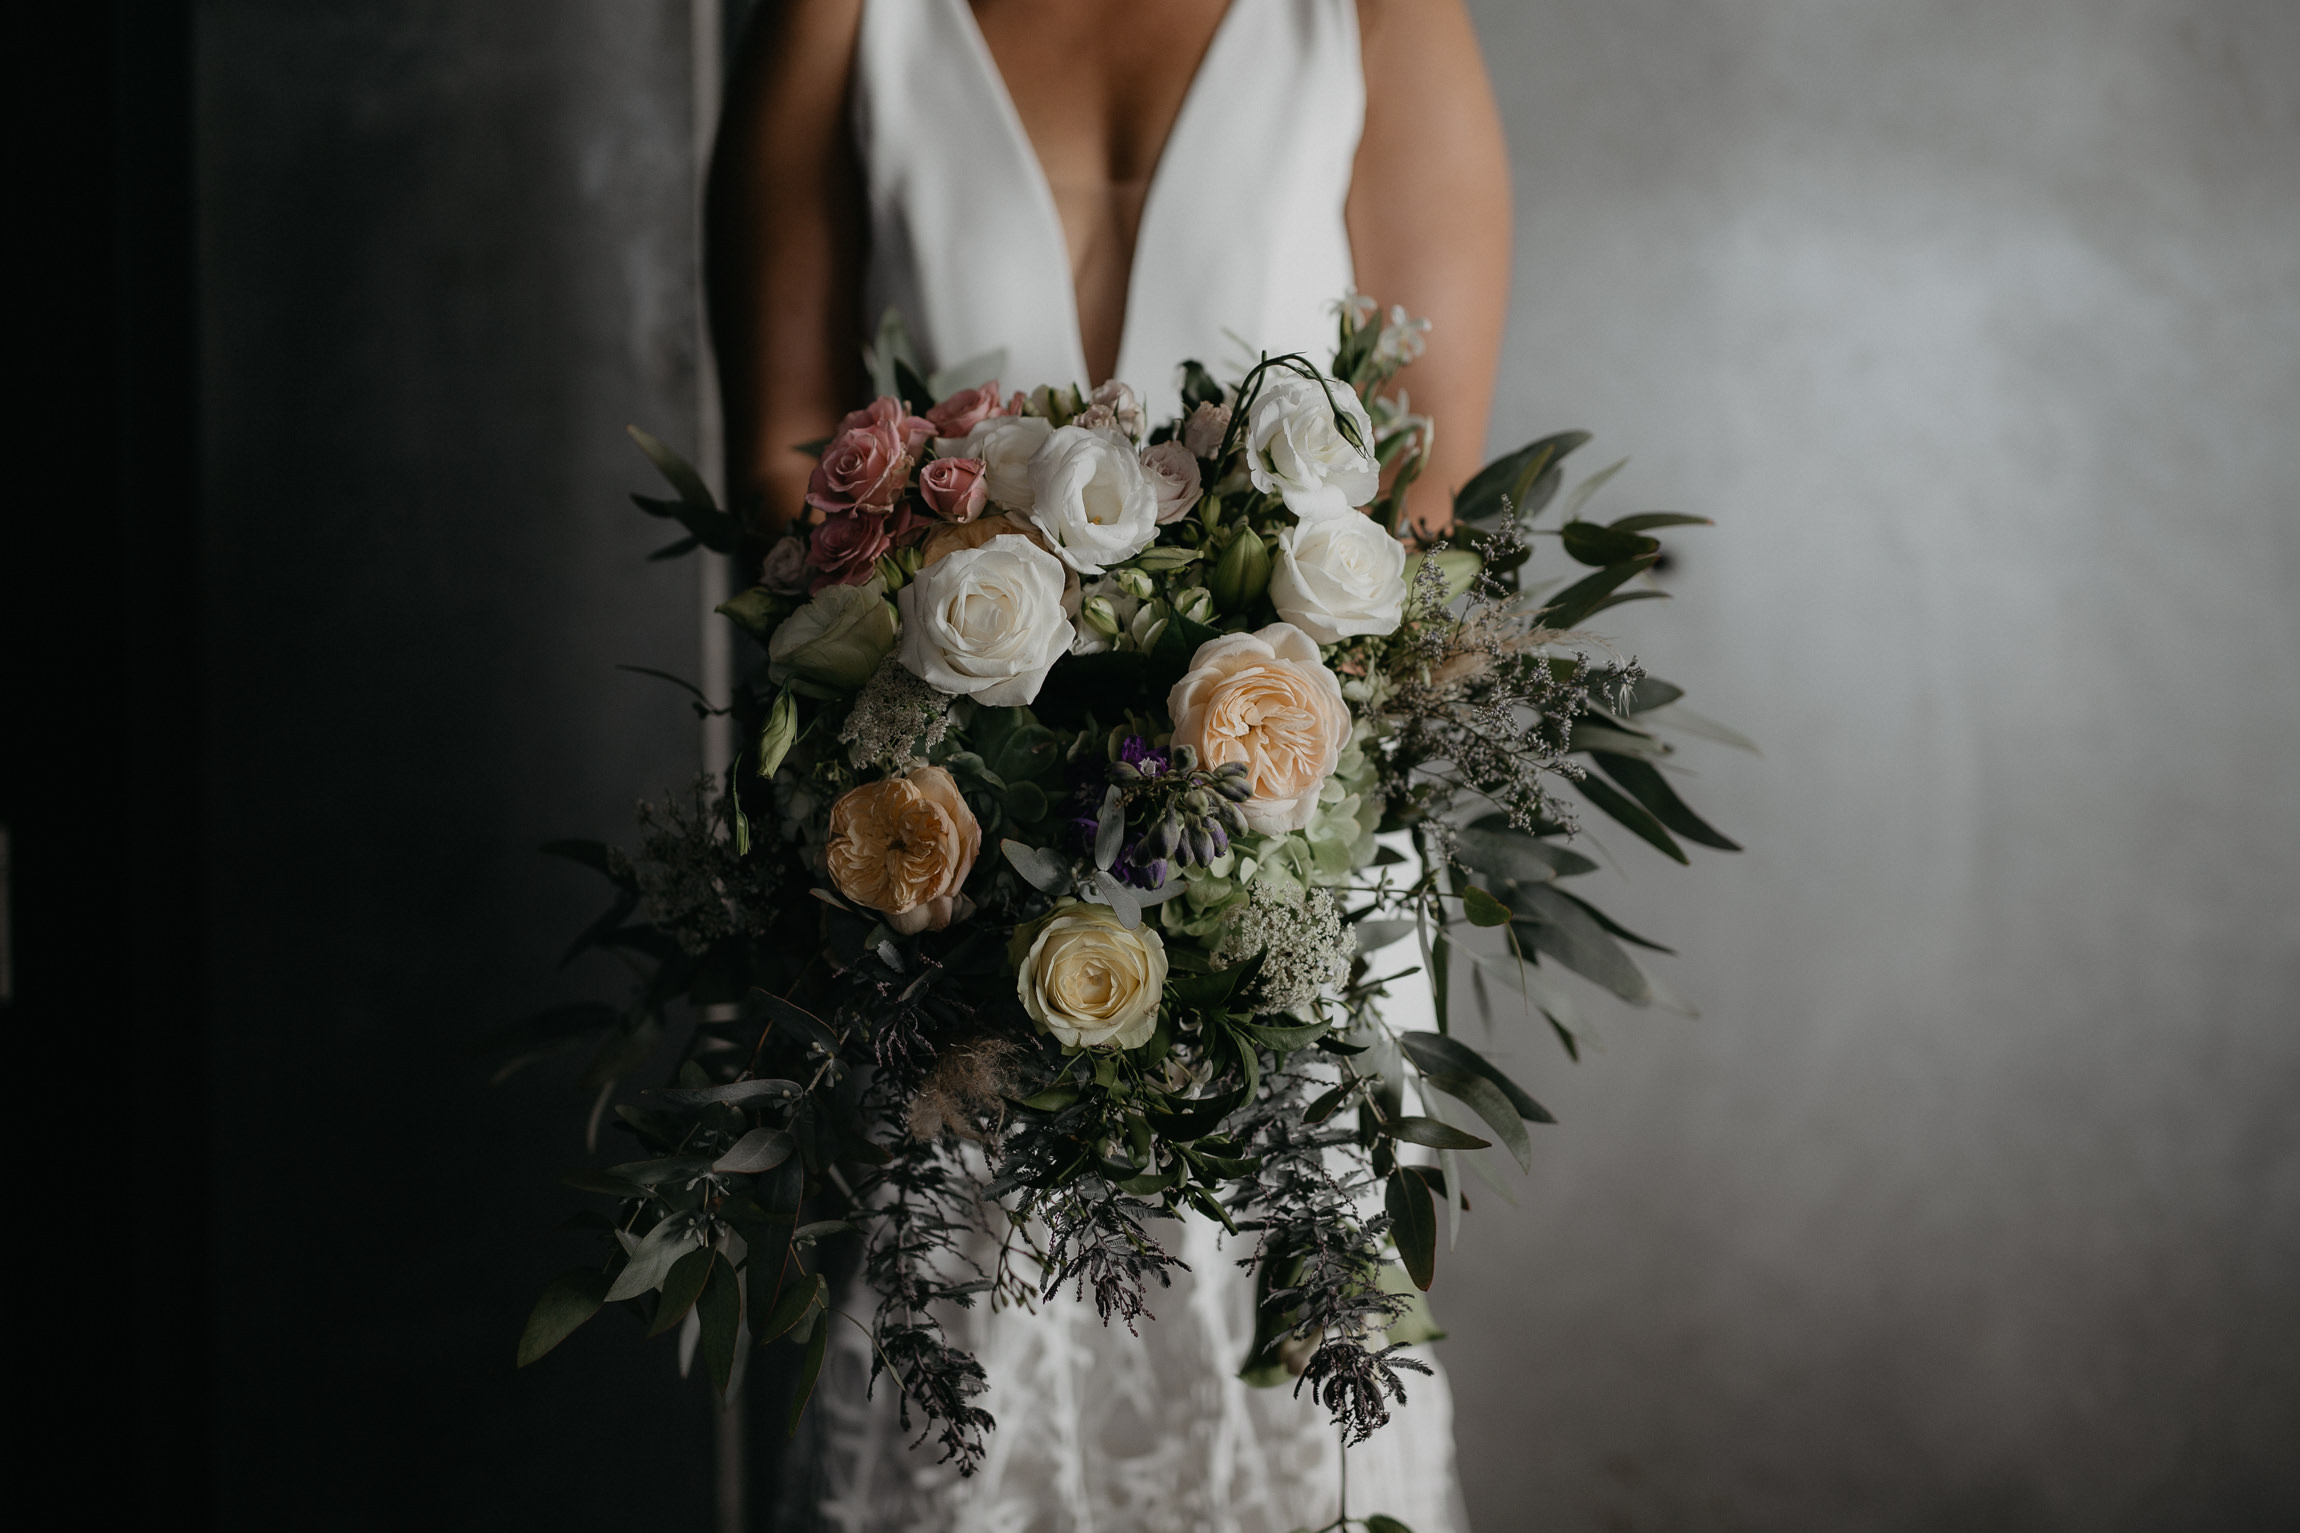 oldforestschool-wedding-blog-25.jpg